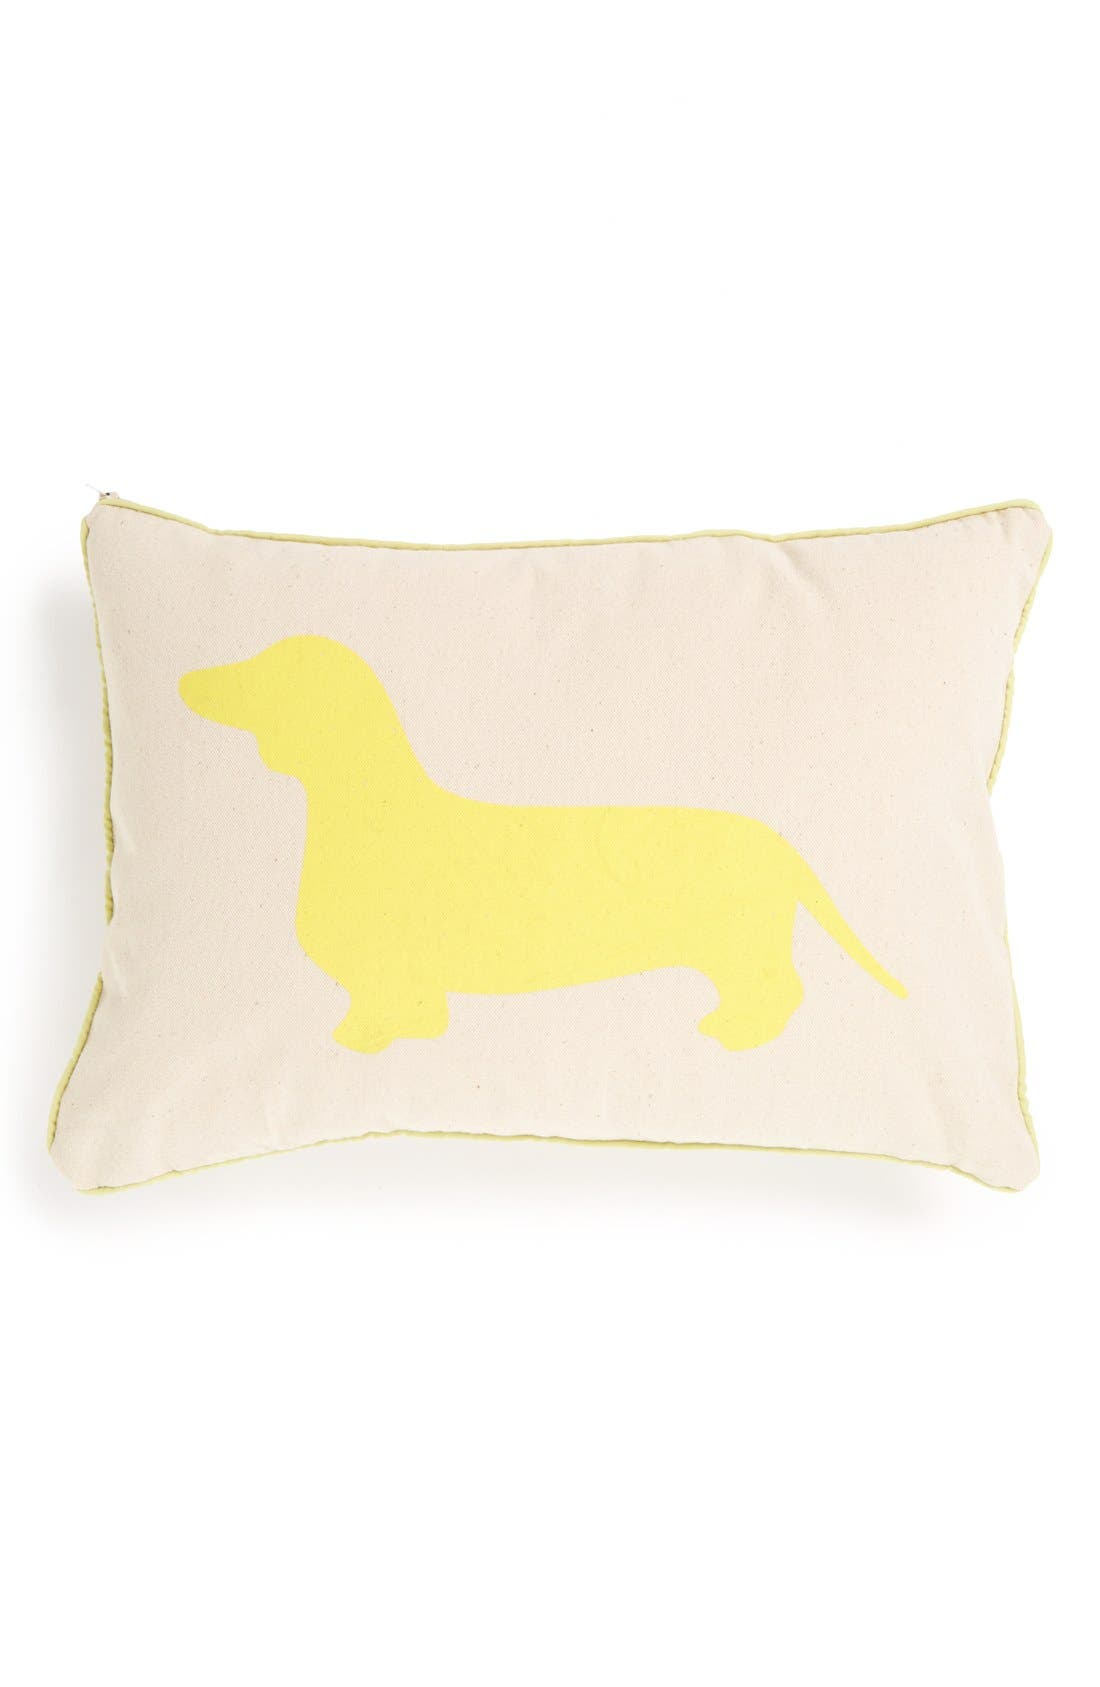 Alternate Image 1 Selected - Romy + Jacob 'Dachshund' Pillow